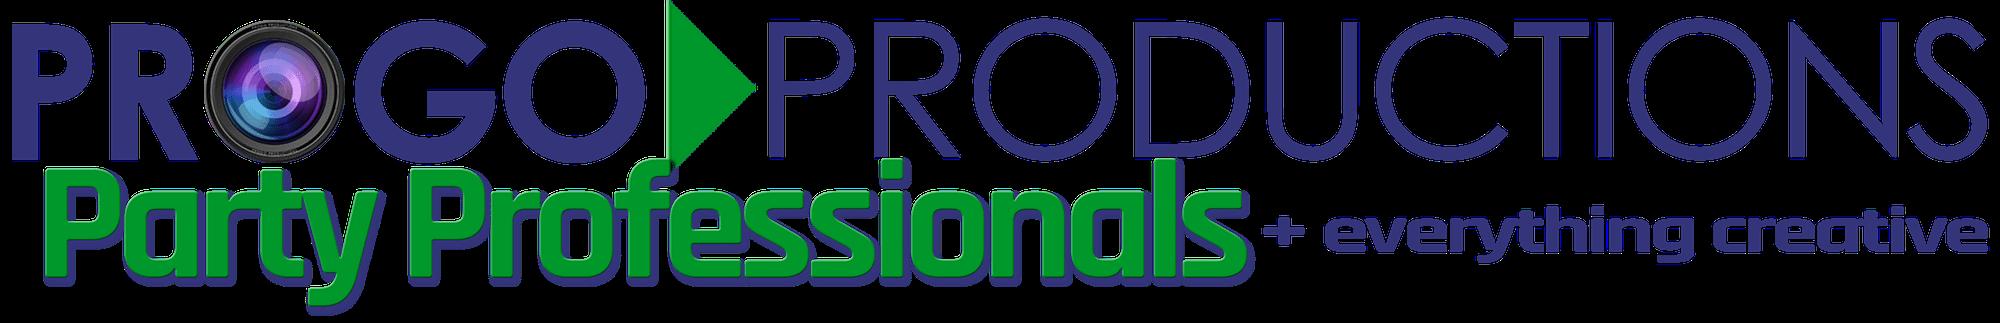 ProGo Productions | (262) 563-2017